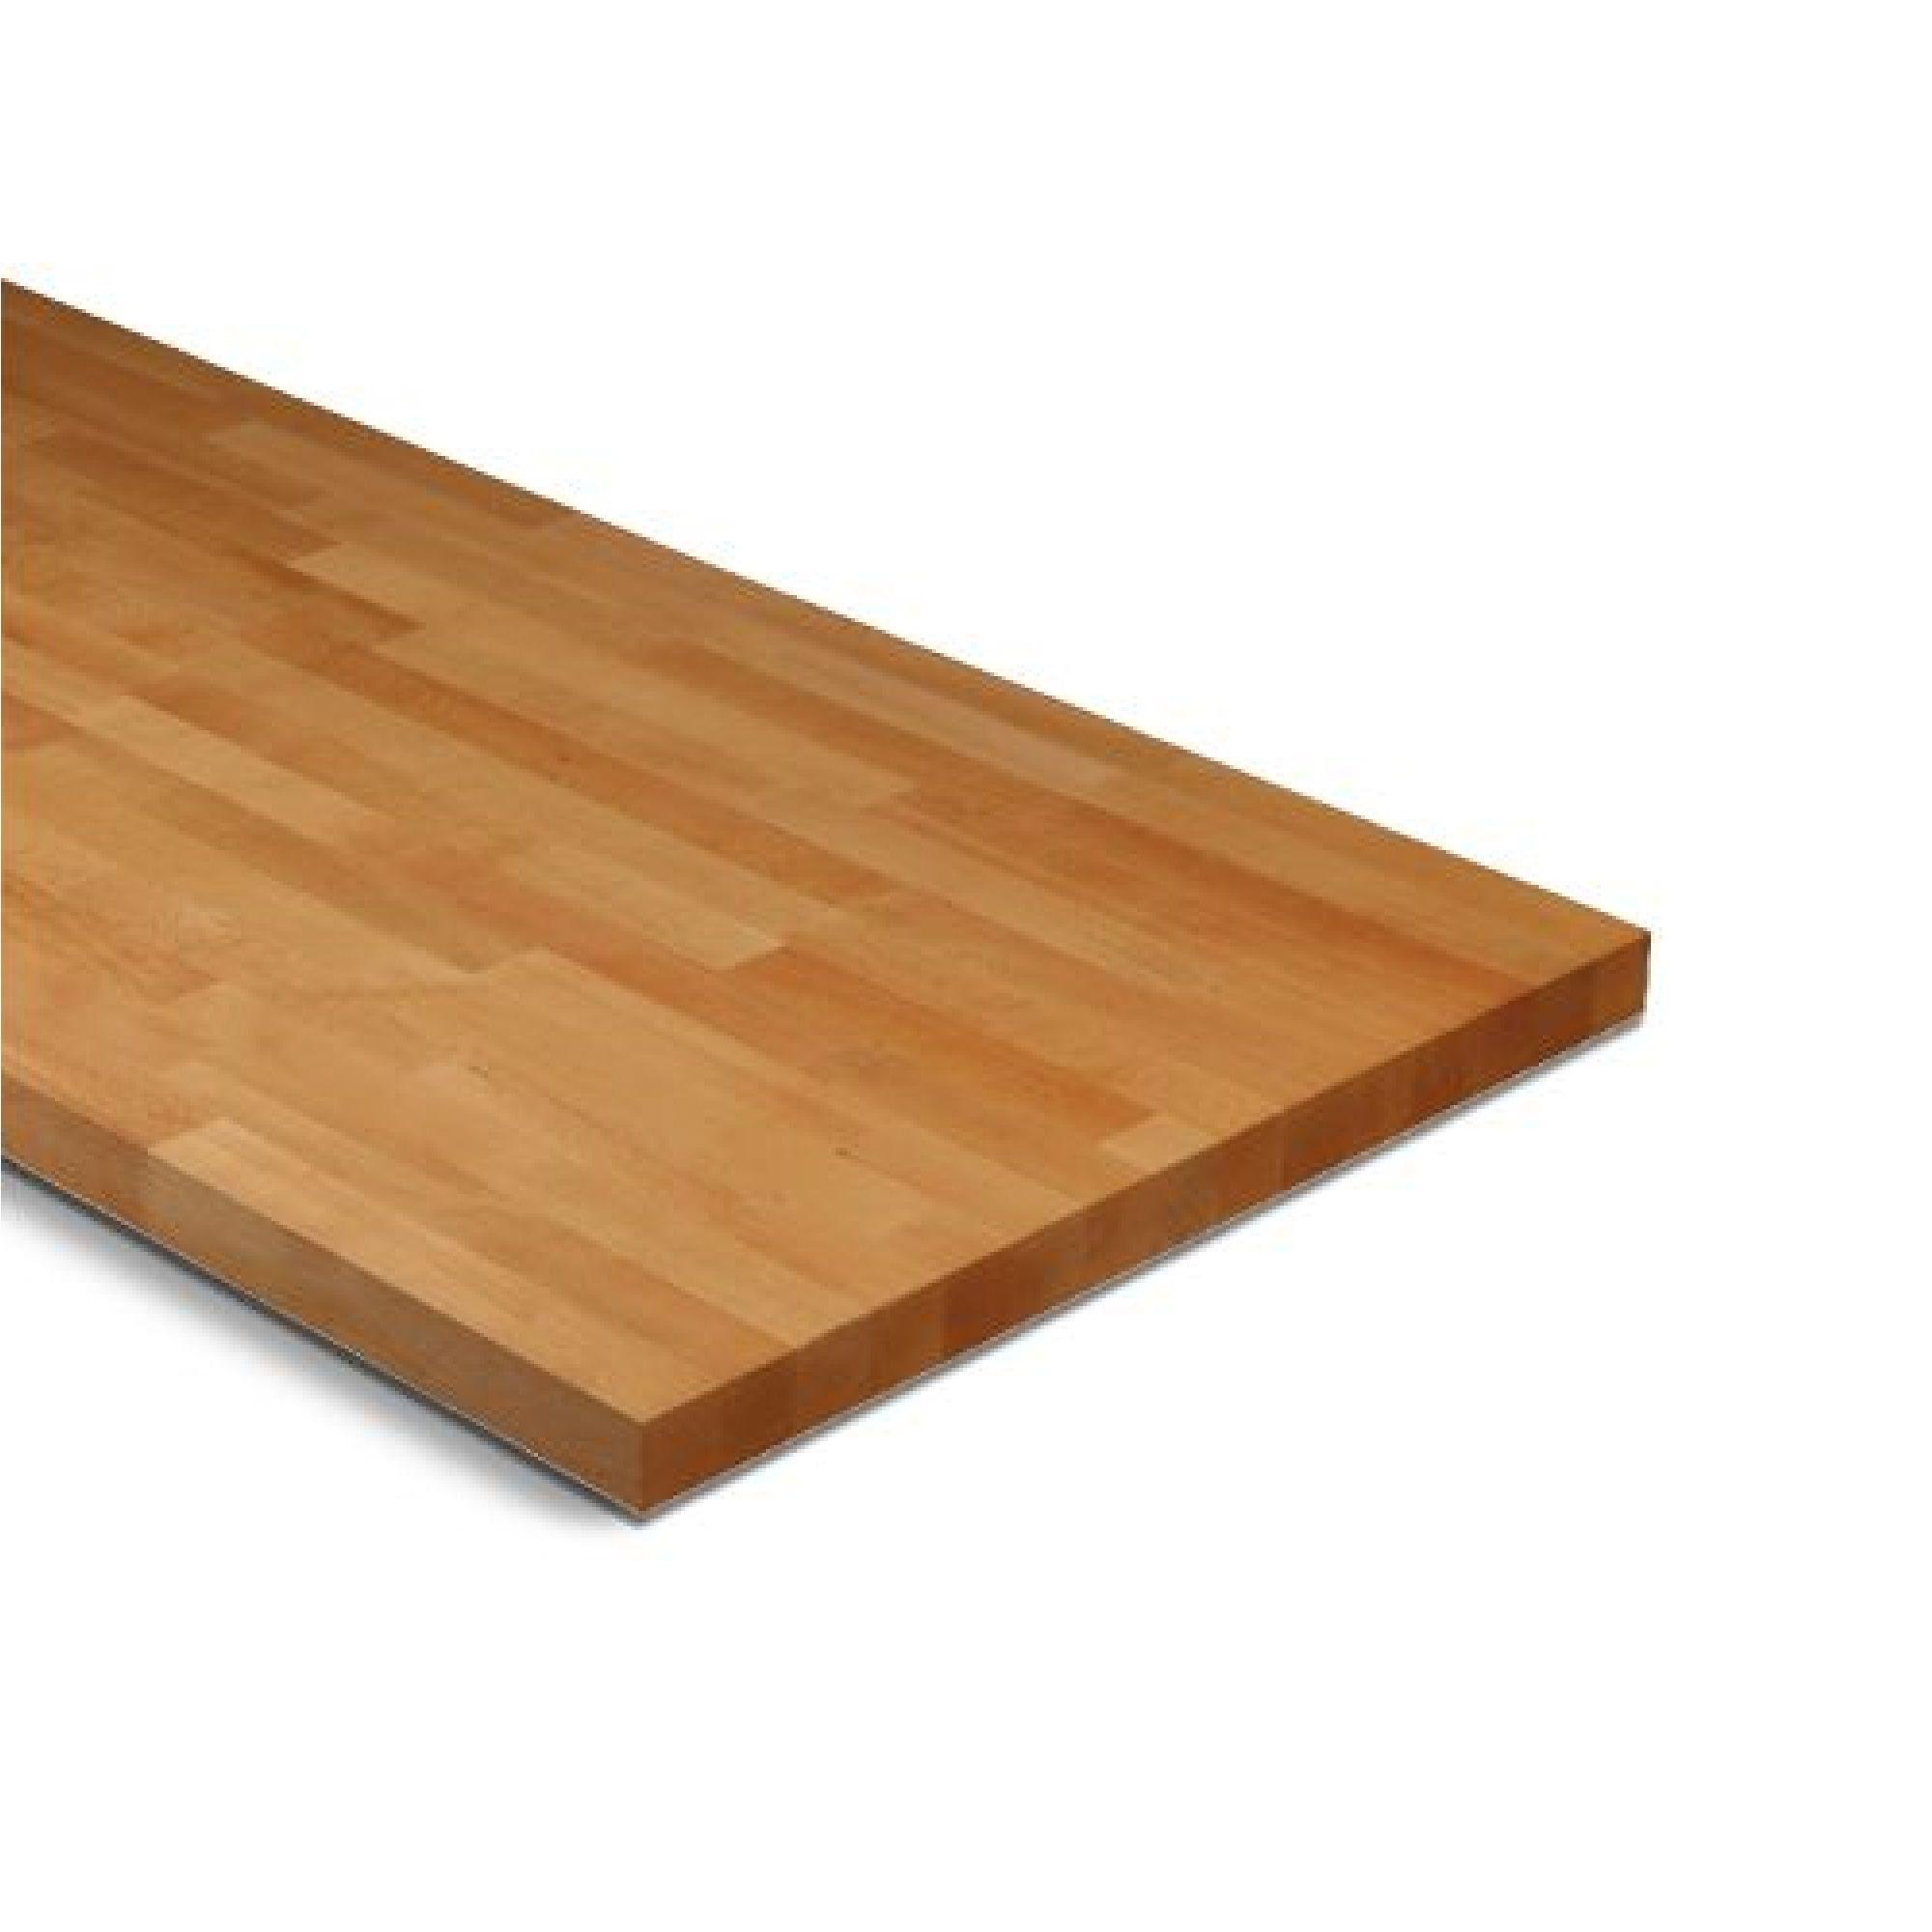 27mm solid wood beech square edge worktop l 3000mm d. Black Bedroom Furniture Sets. Home Design Ideas